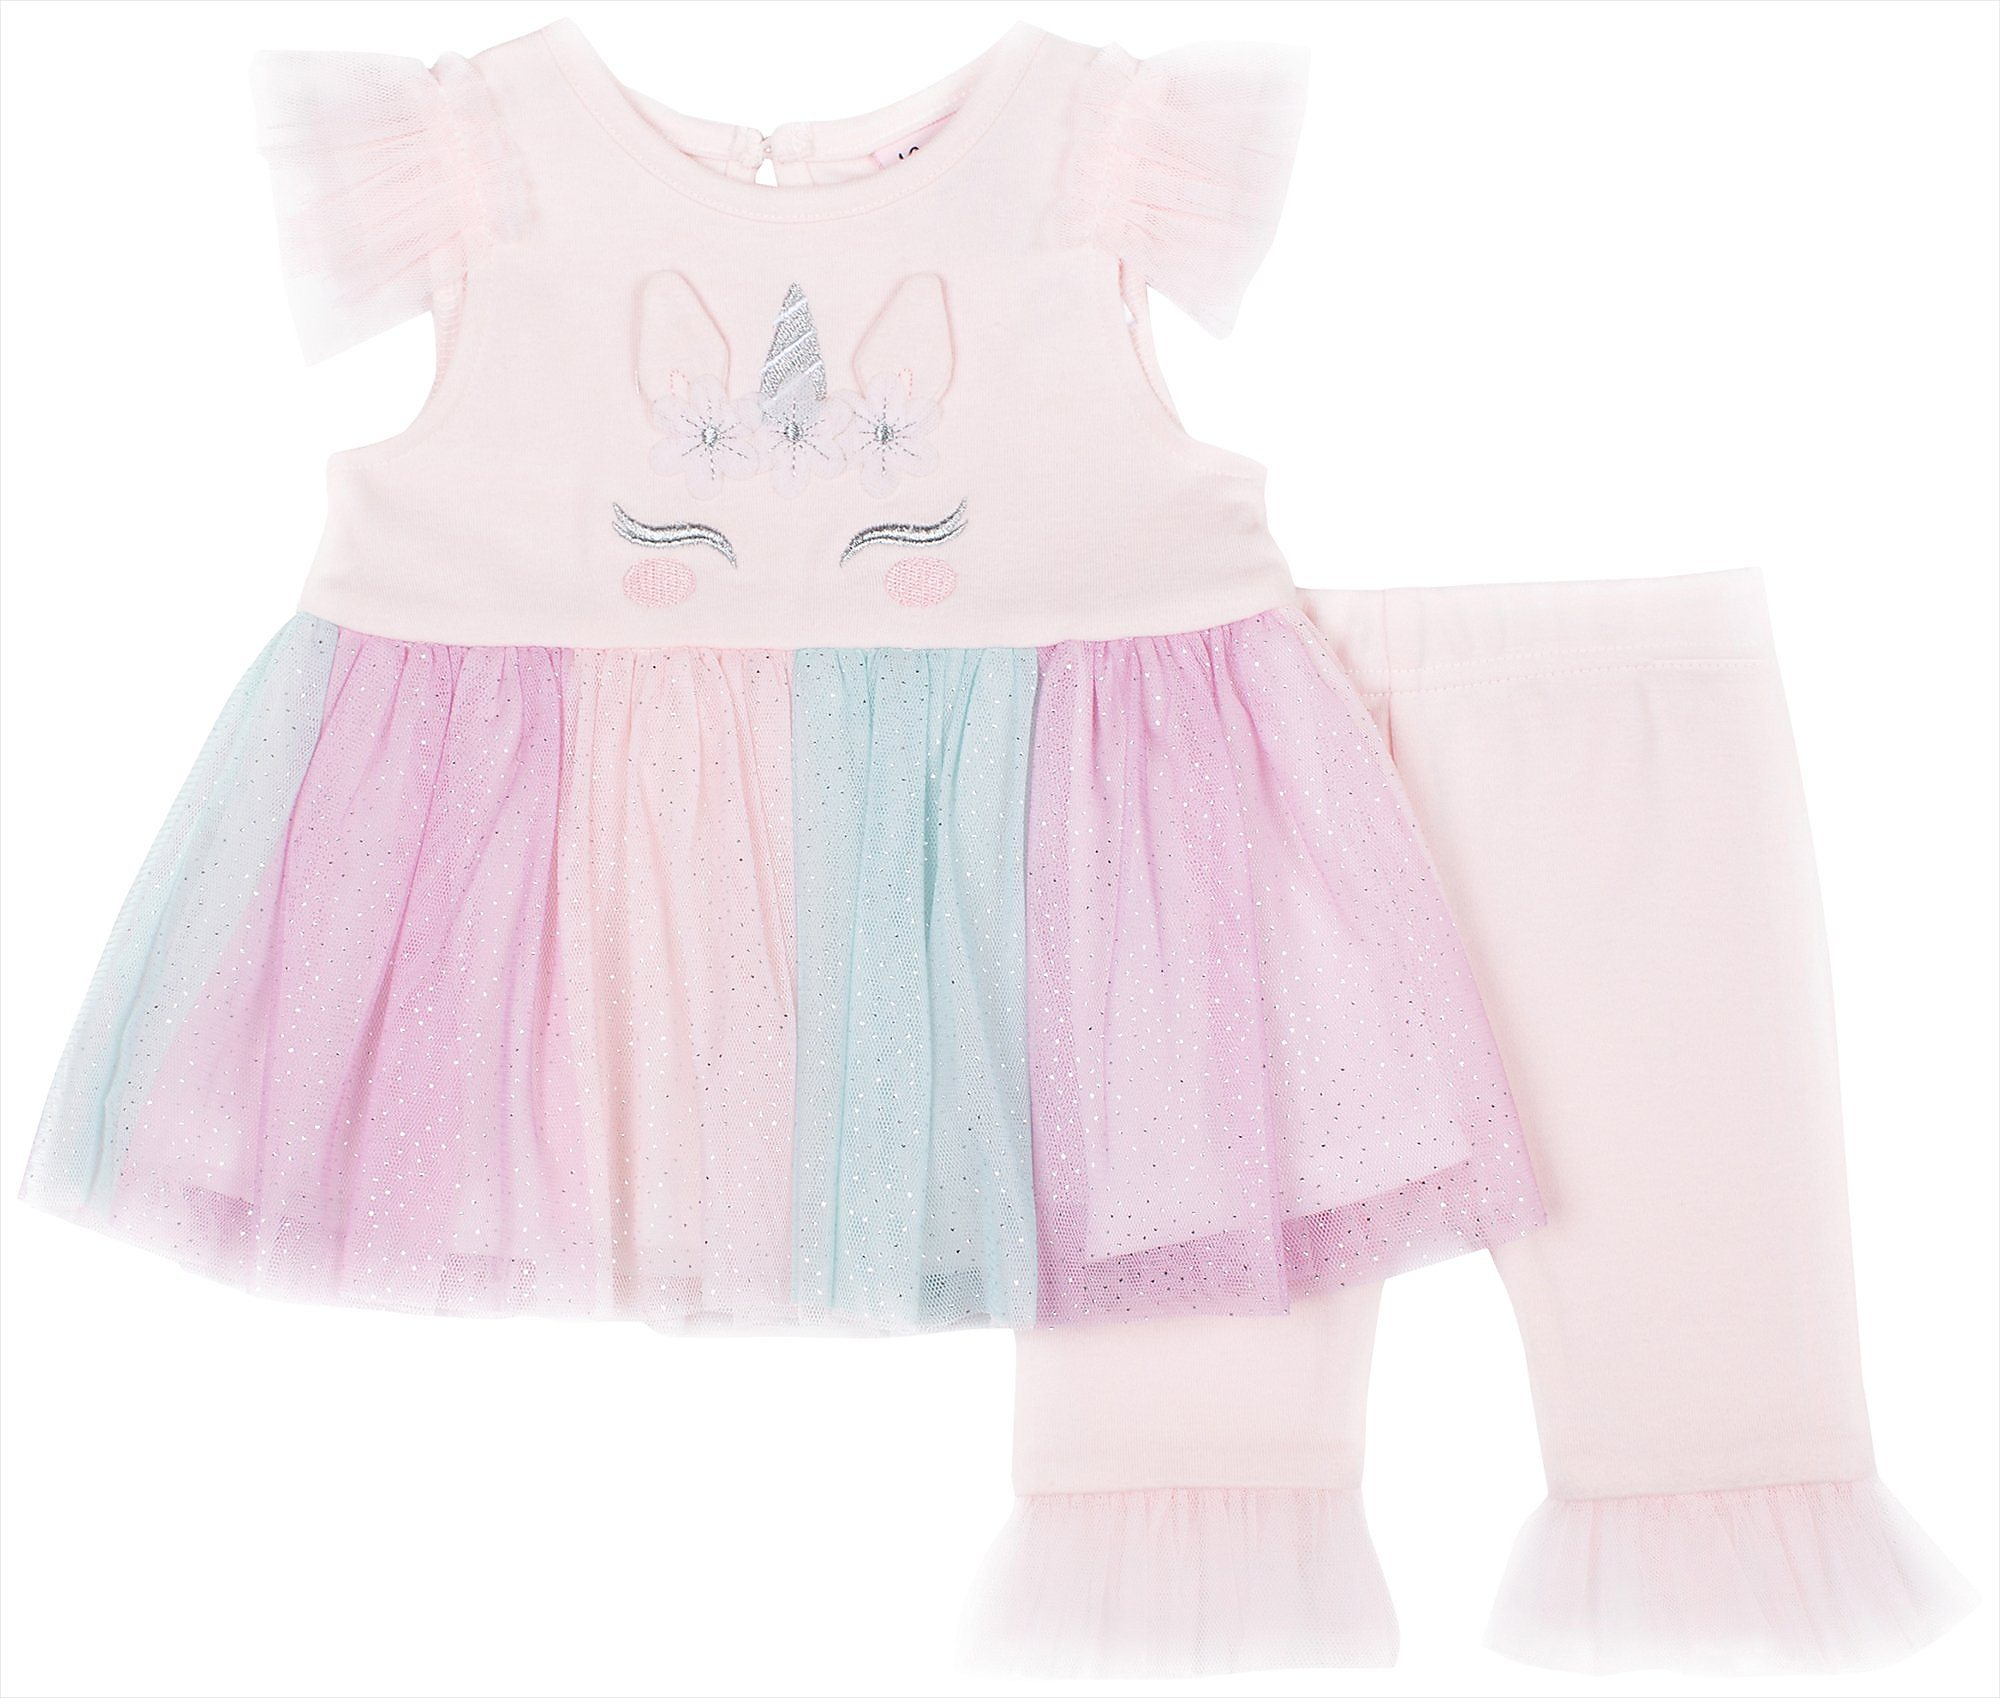 c46b14c3c2c1a Little Lass Baby Girls Unicorn Glitter Capri Leggings Set | eBay